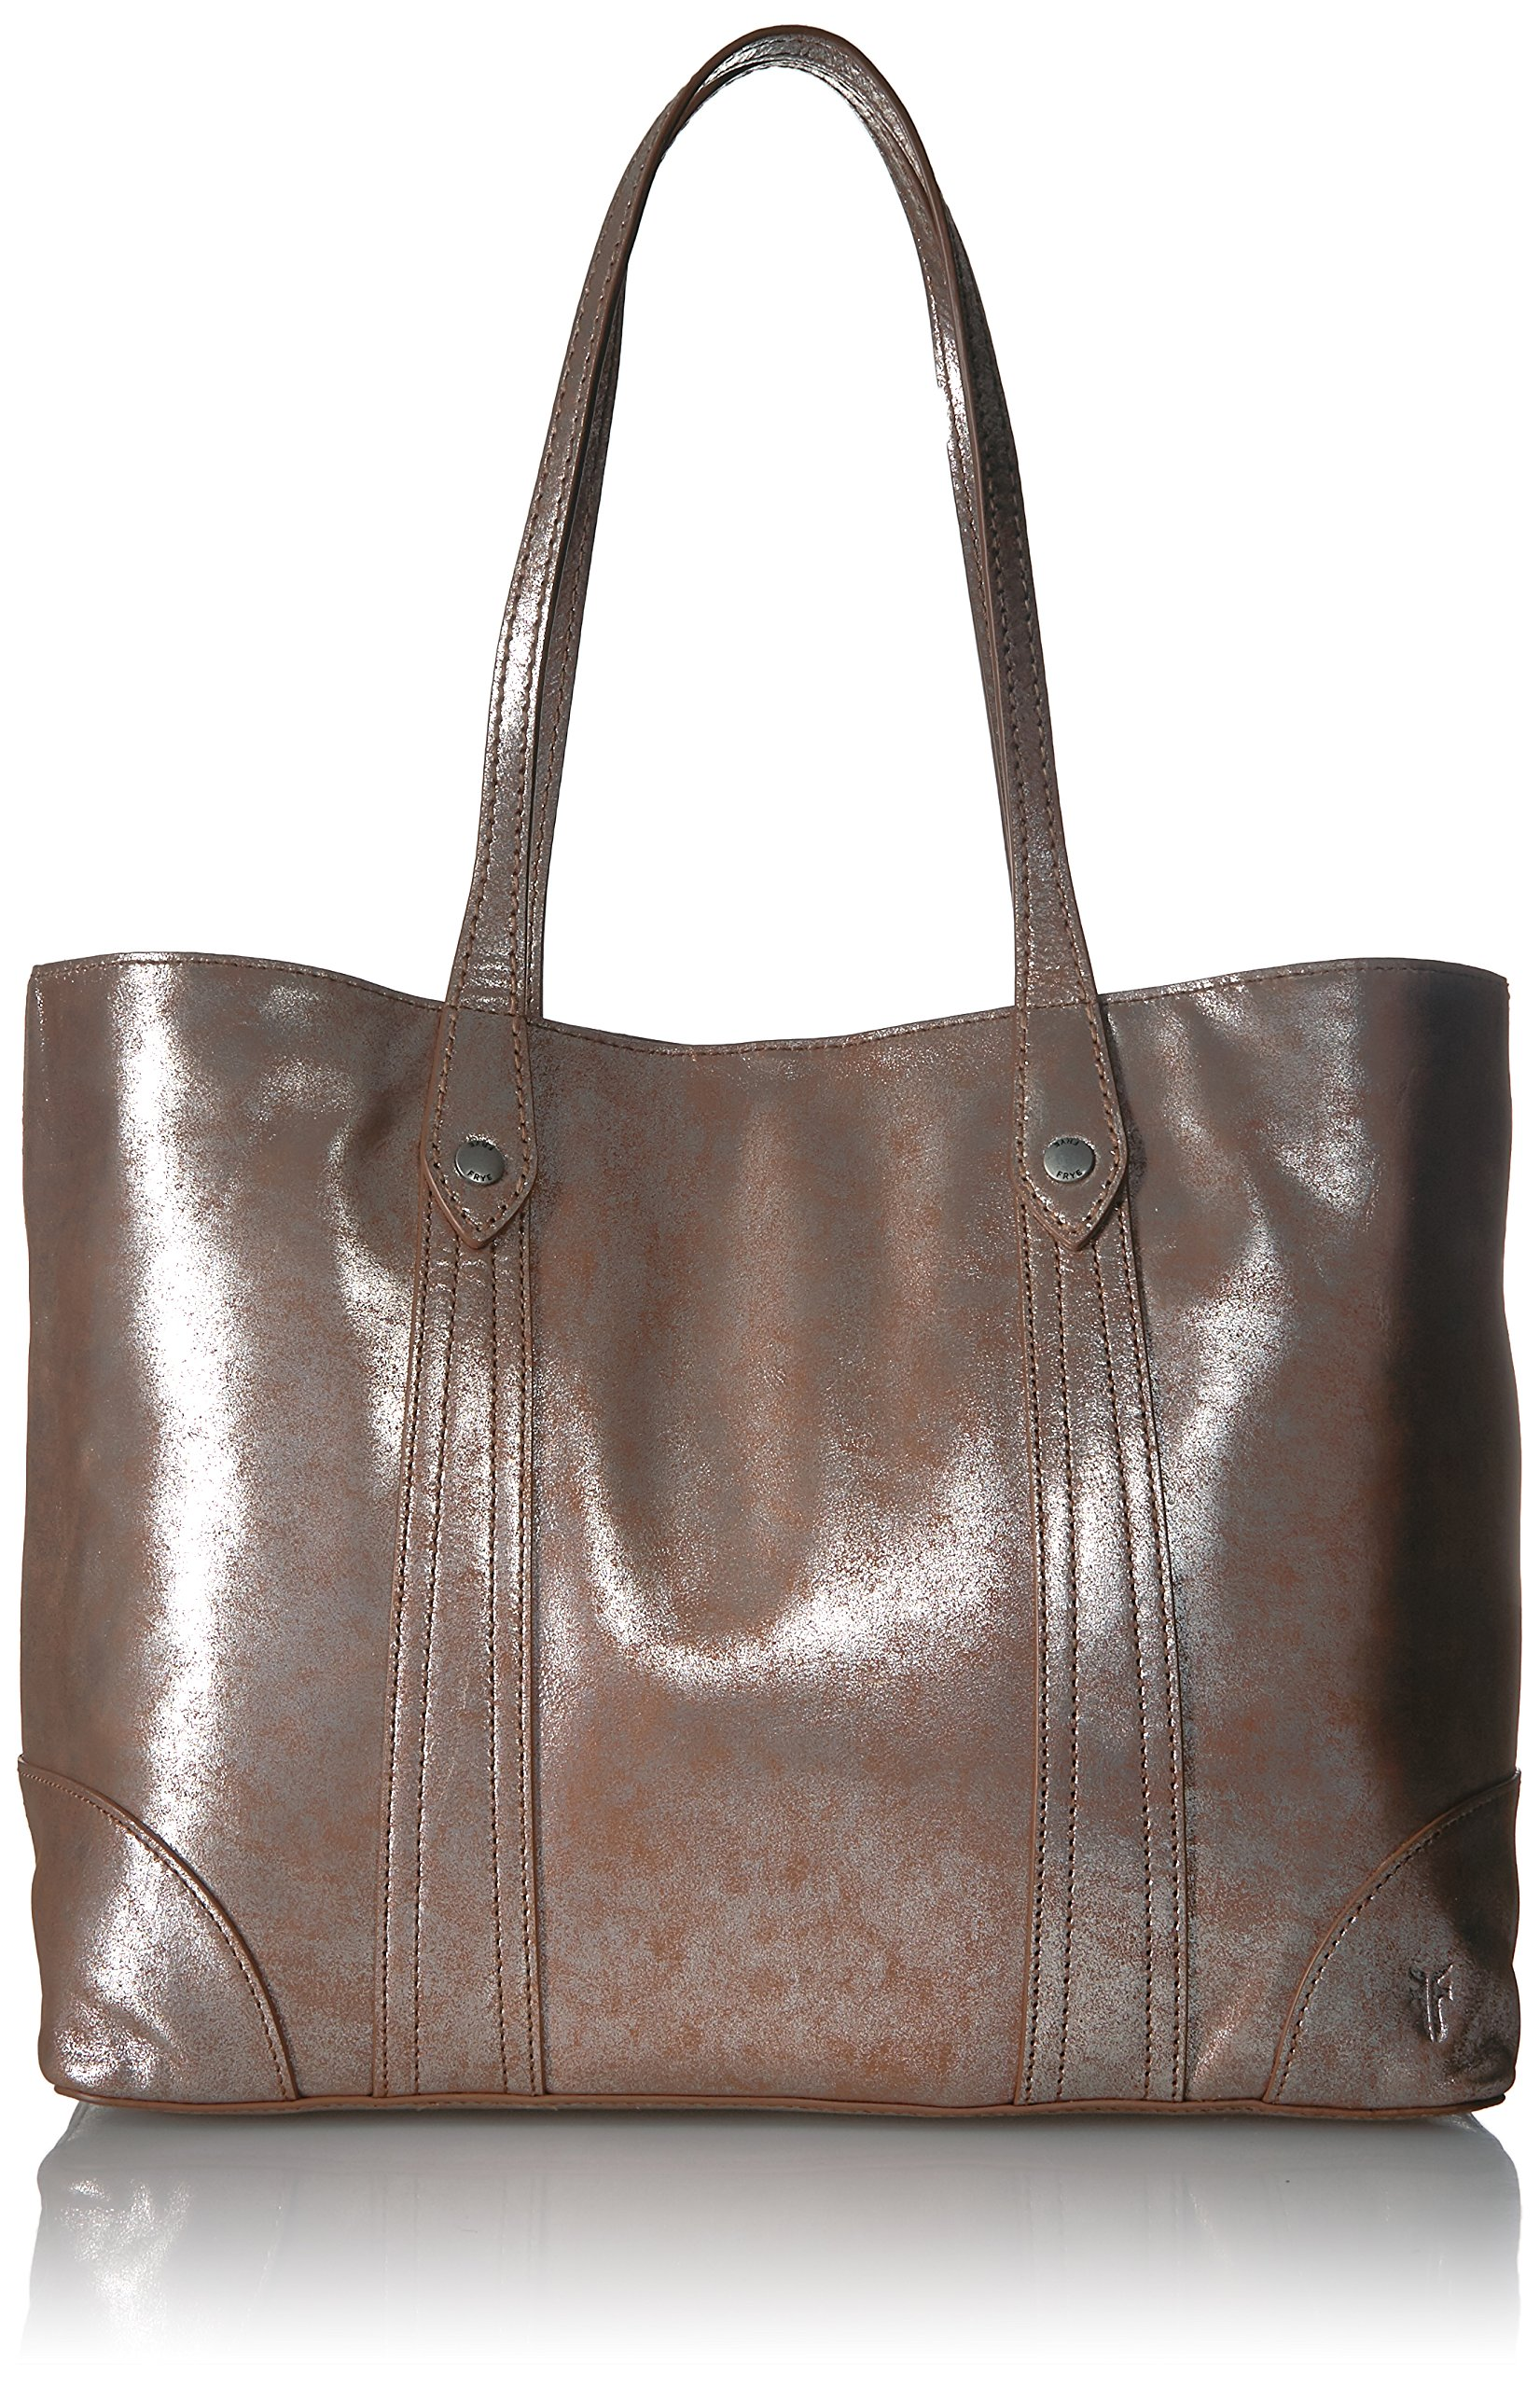 FRYE Melissa Shopper Tote Leather Handbag, Silver/Multi , One Size